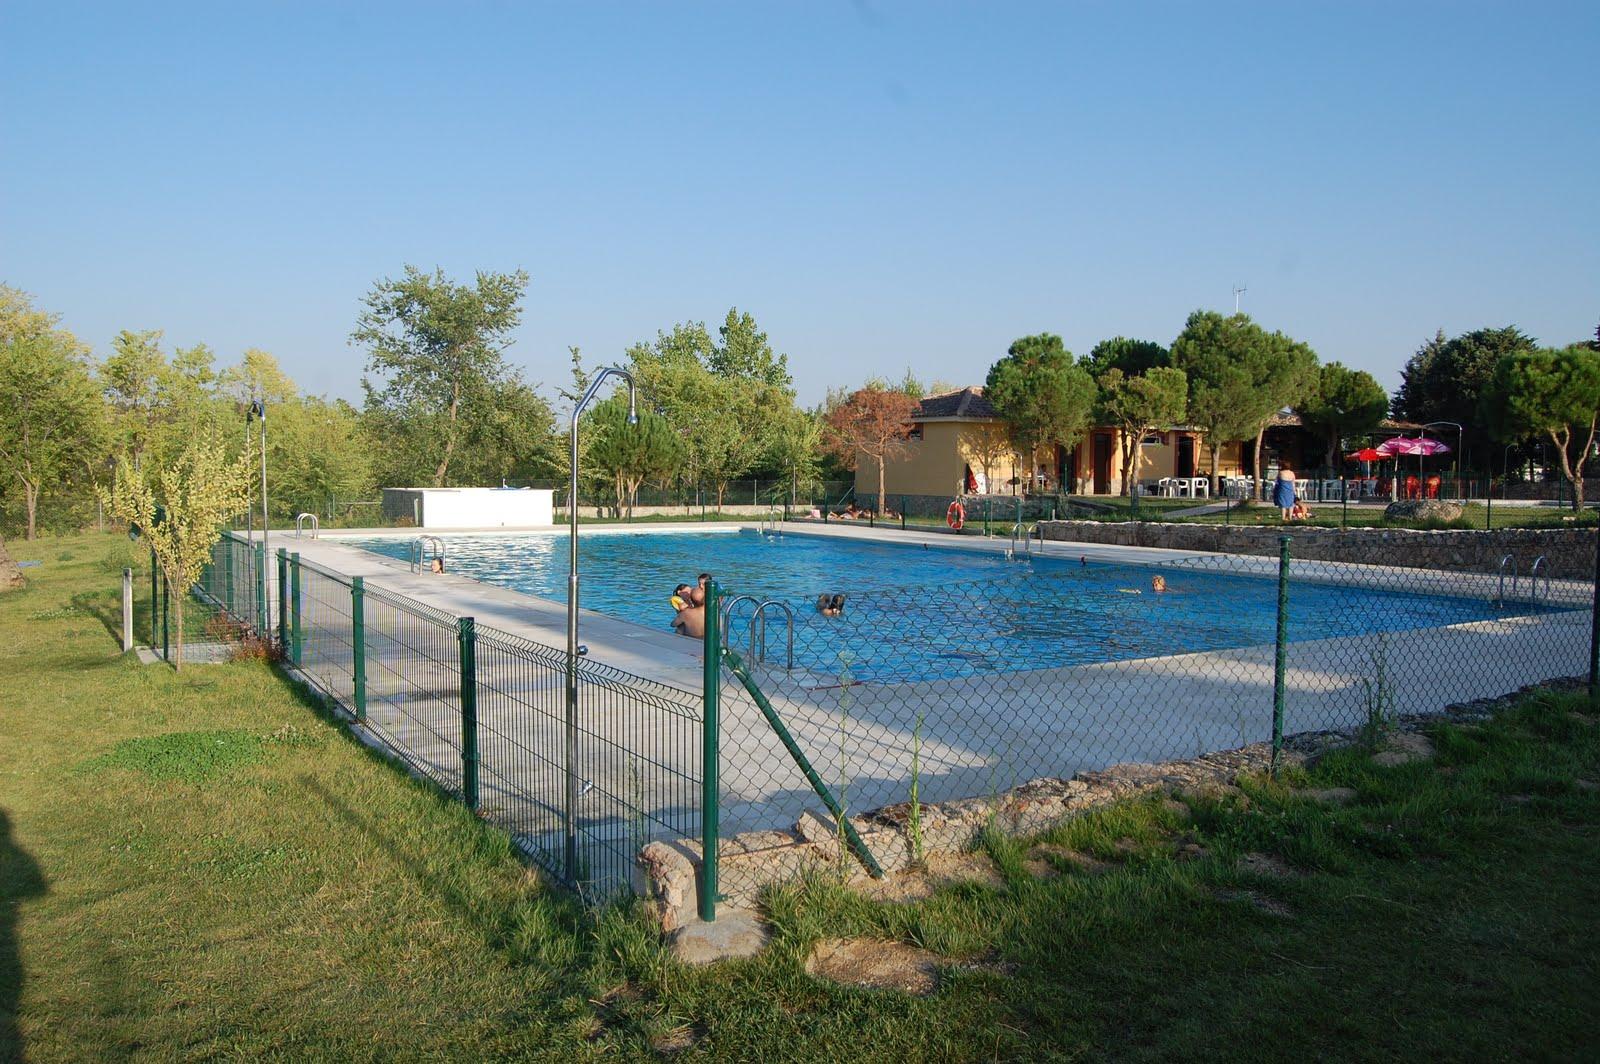 Garciotum el blog de lvaro palomares gonz lez ma ana se abre la piscina municipal y el bar - Piscina municipal toledo ...